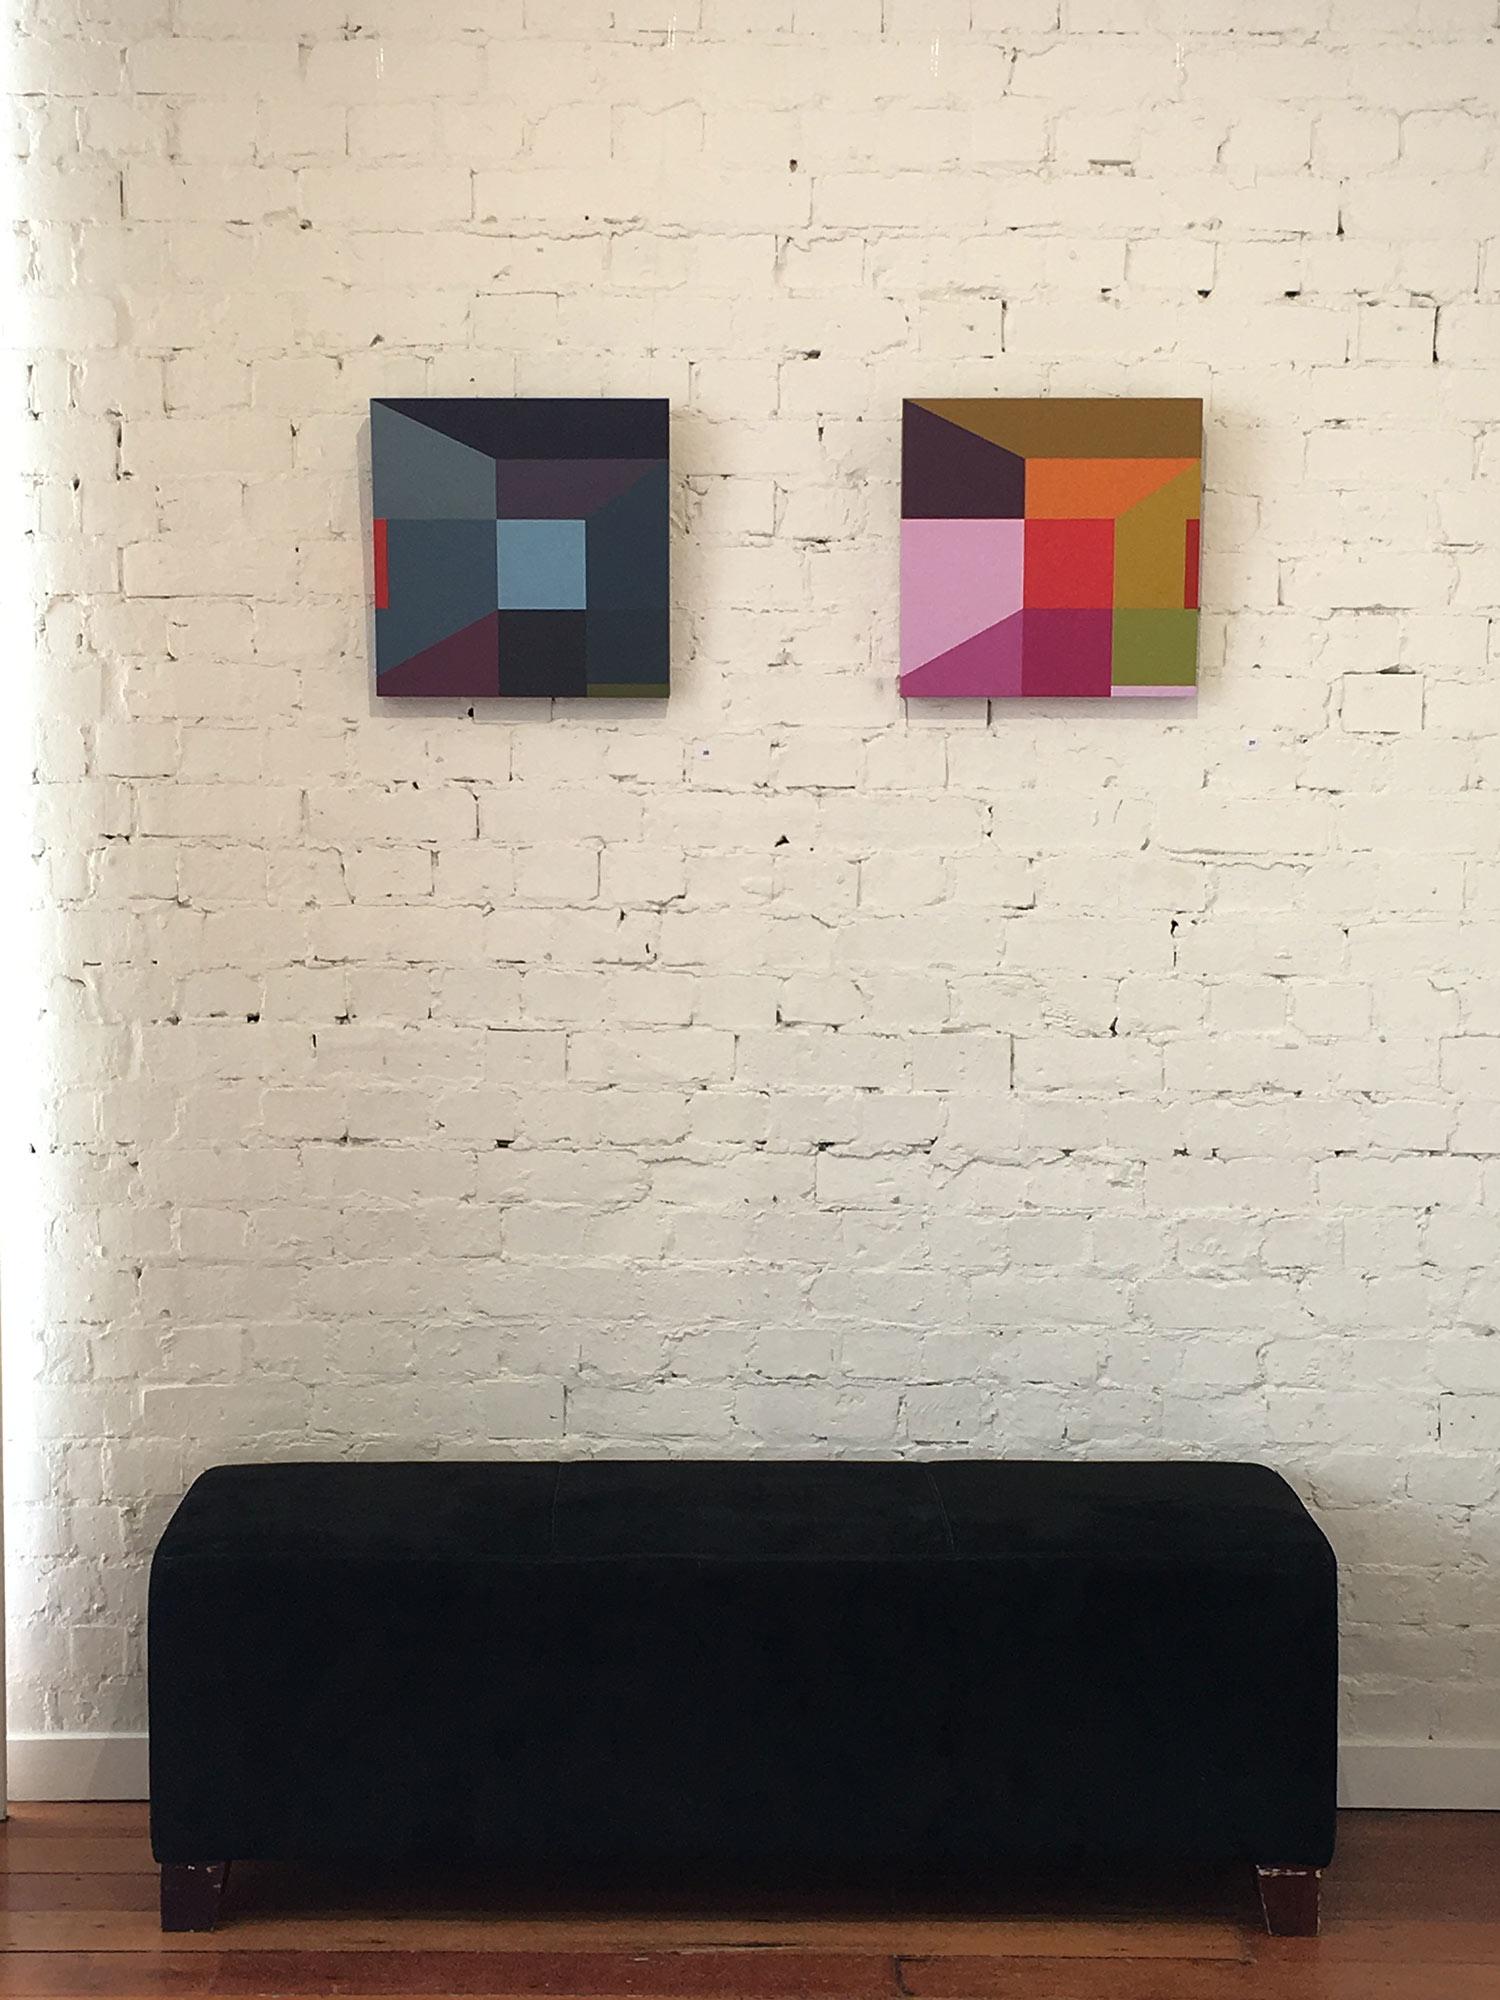 dilogical_exhibition_8_amanda_wilkinson_jan_2019_w.jpg